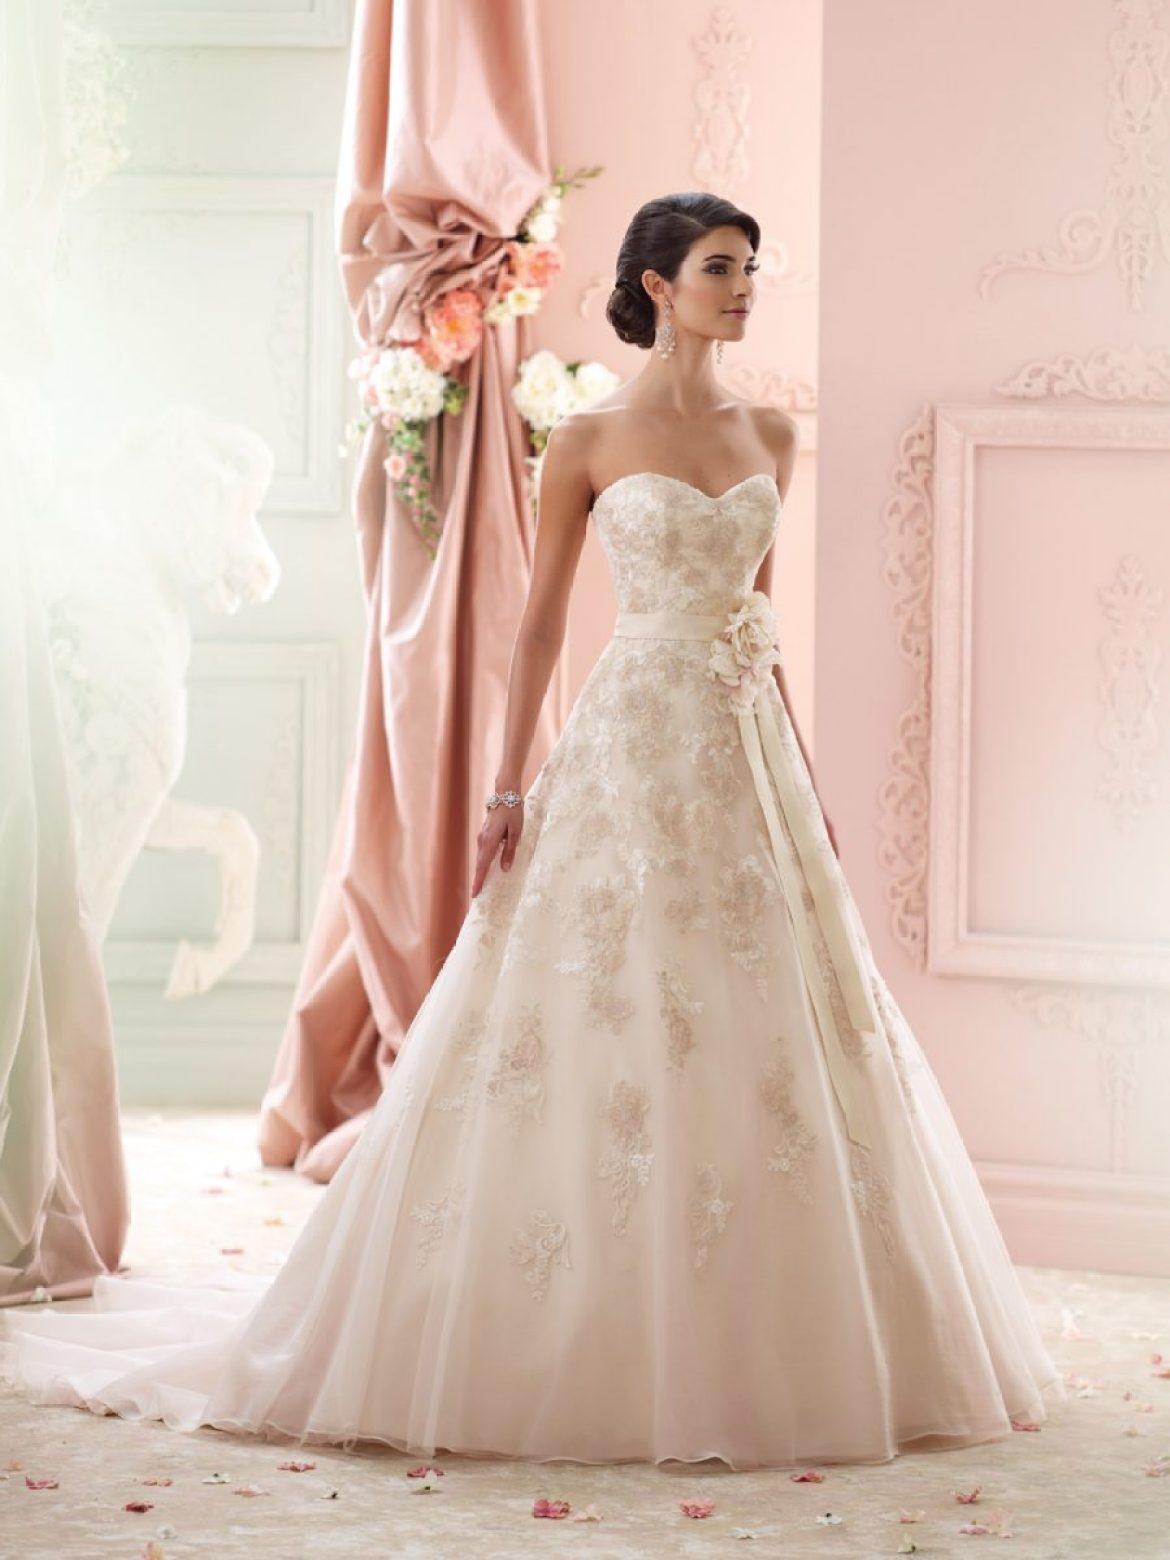 Vestido de noiva tomara-que-caia corte princesa. Da Tutti Sposa.